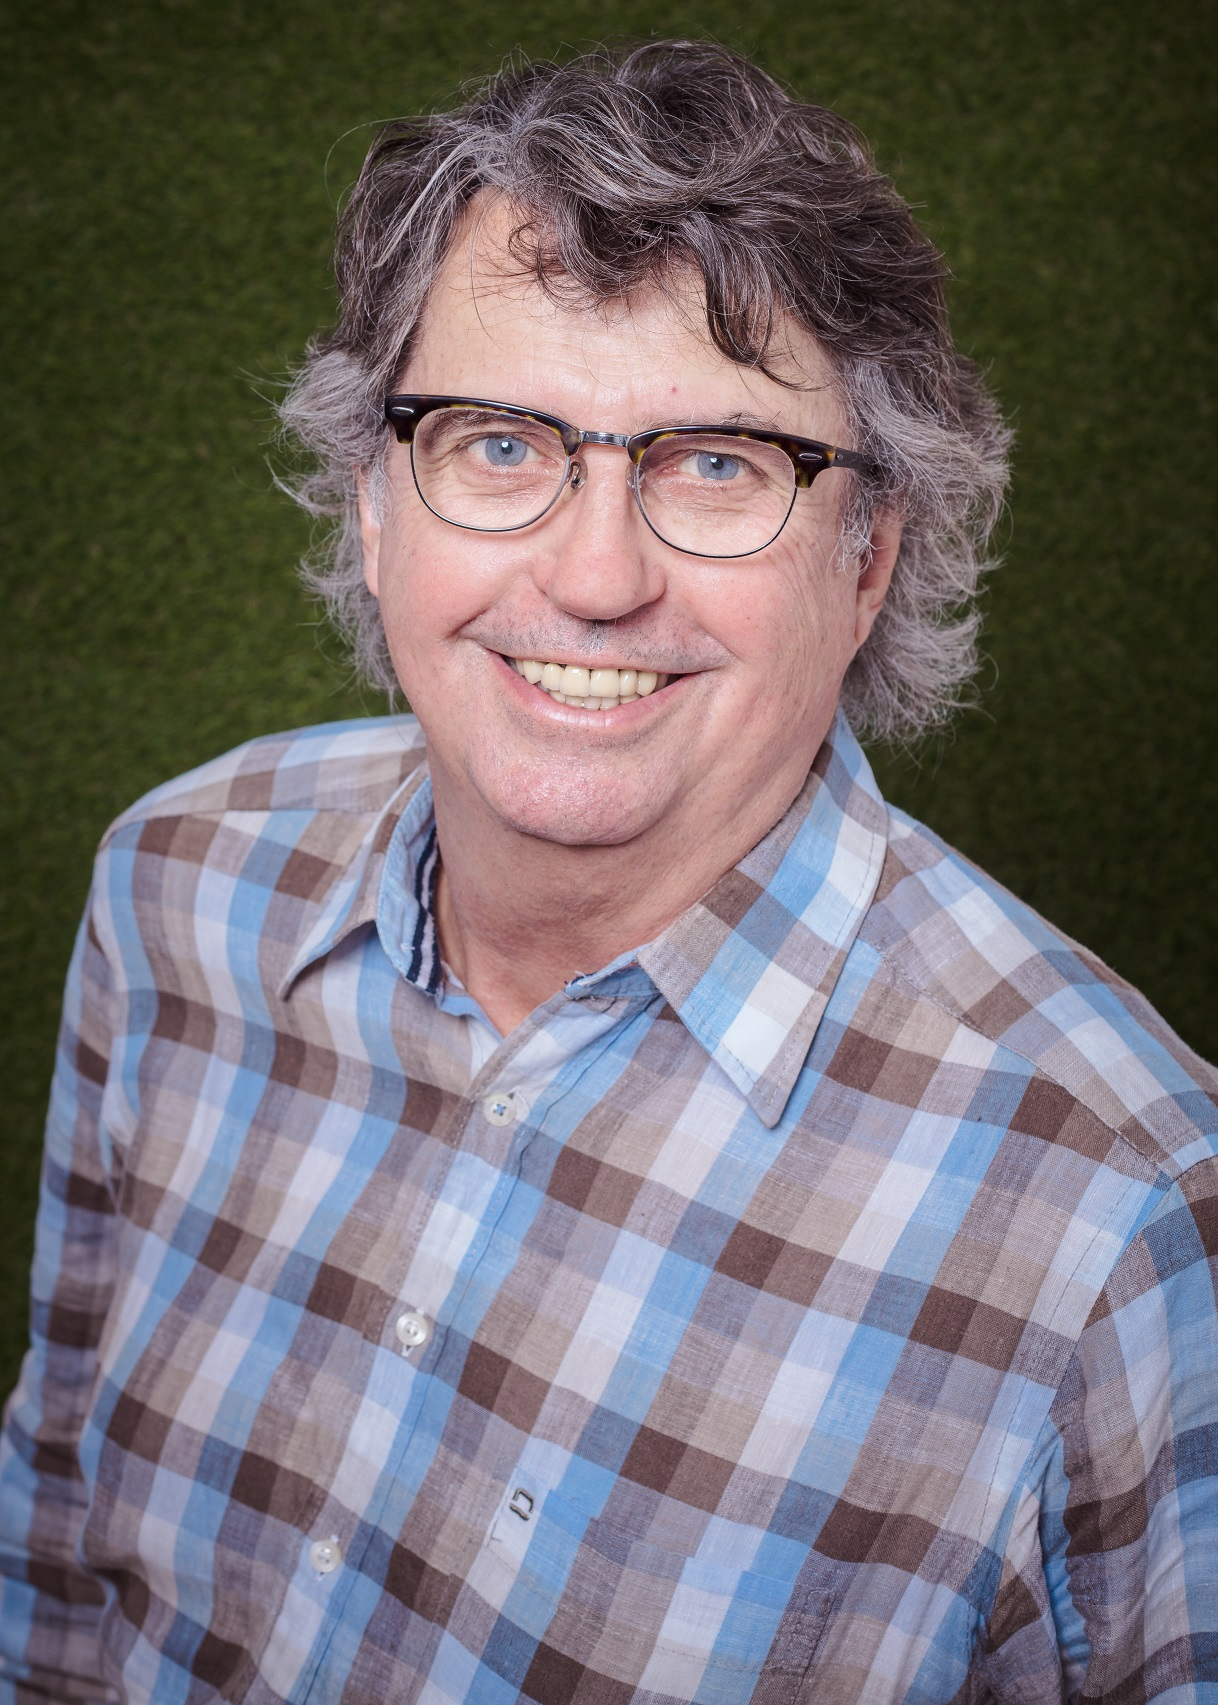 Karl-Heinz Vogel